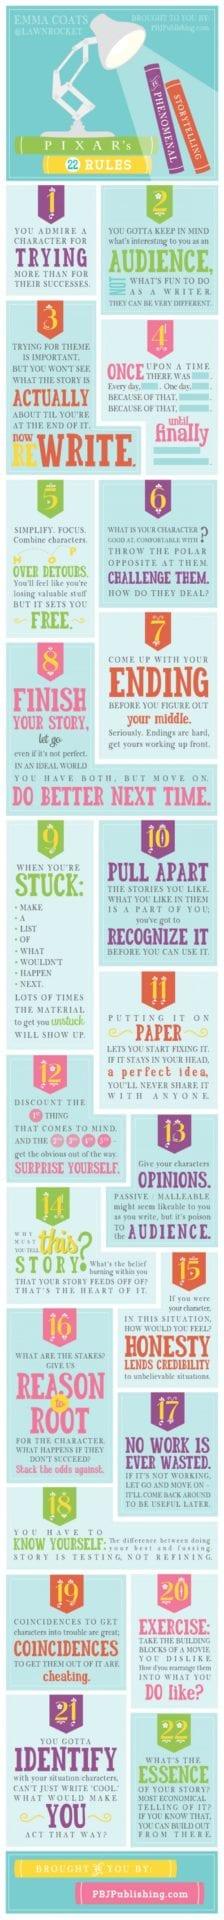 Emma Coats Pixar's Rules of Storytelling